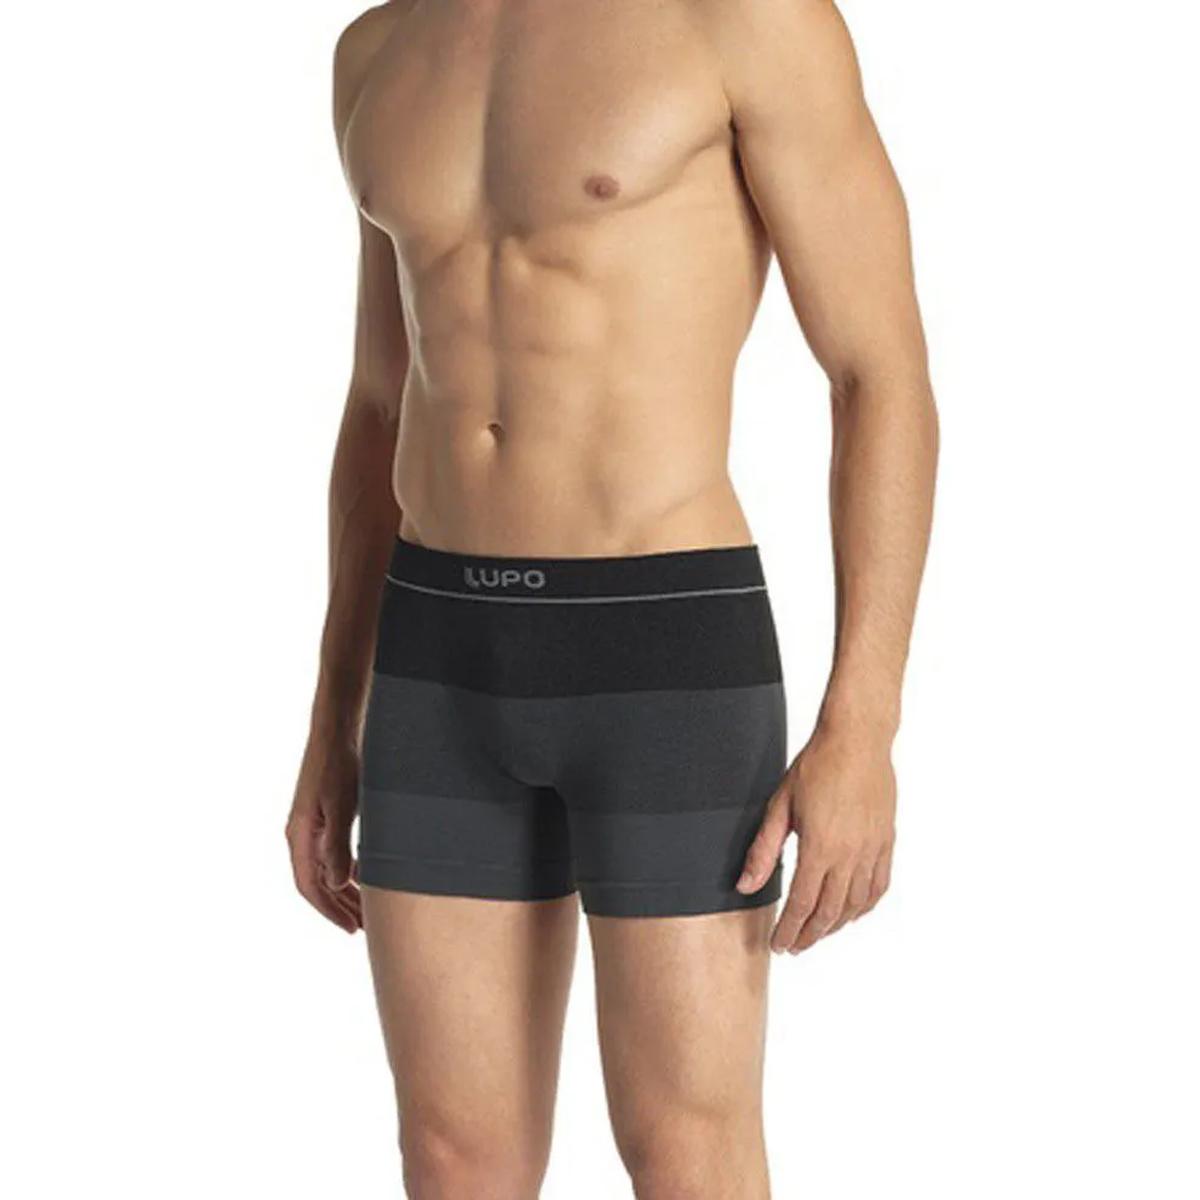 Cueca boxer masculina Lupo box sem costura .